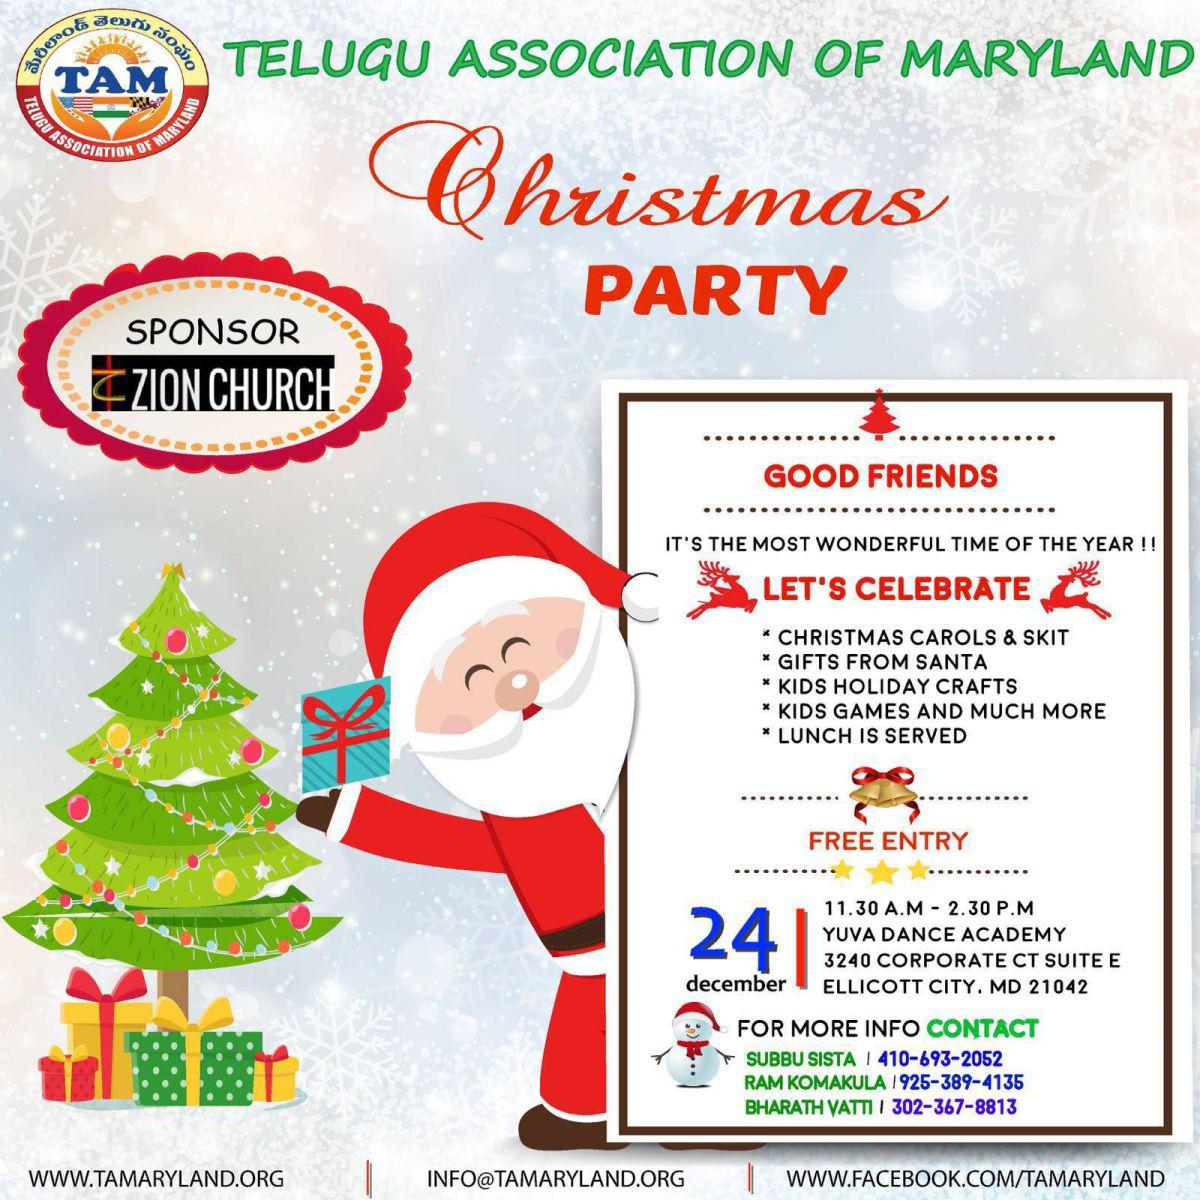 TAM Christmas Celebrations